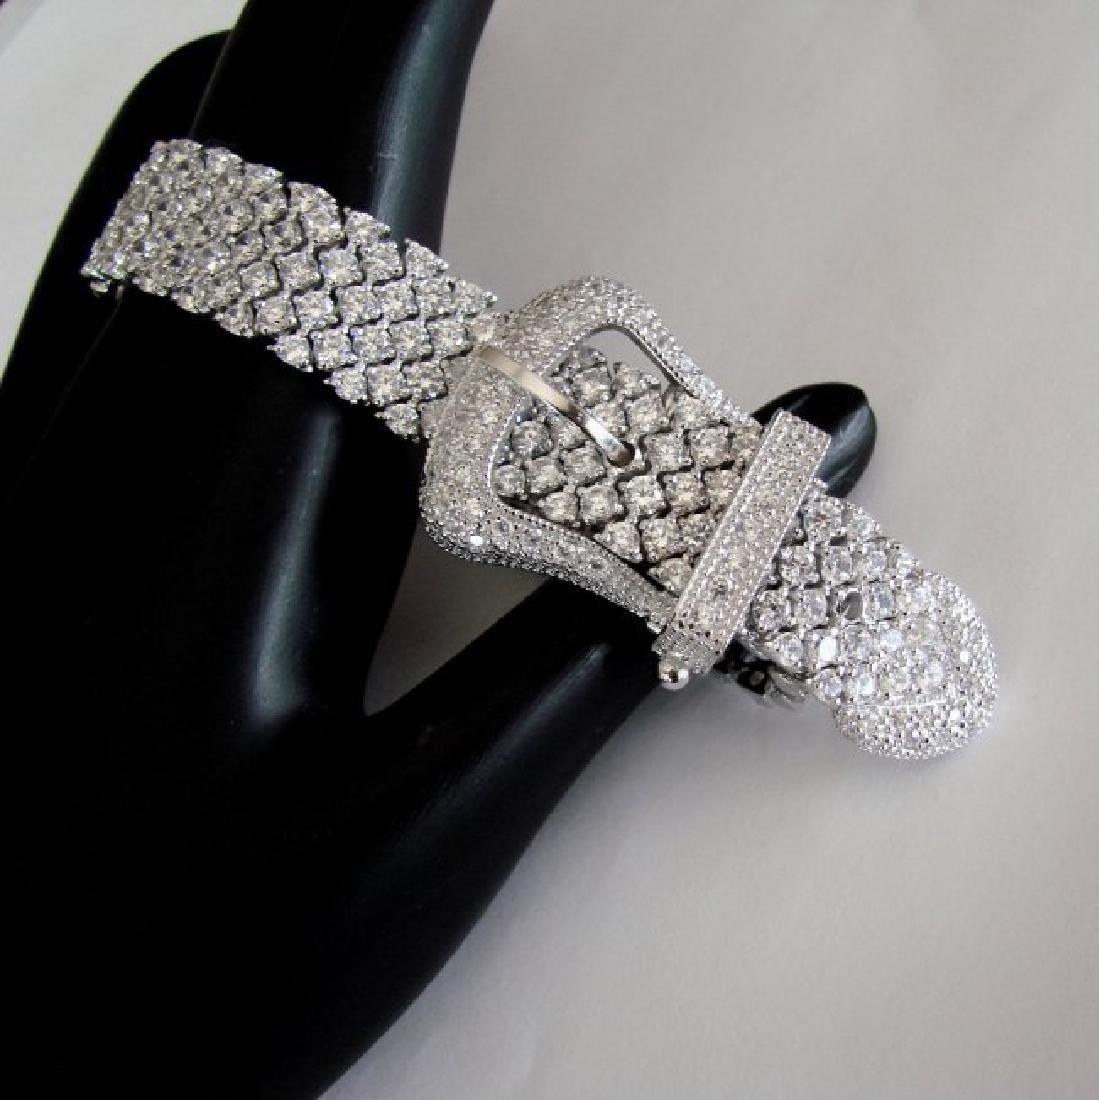 Bracelet Creation Diamond 47.91Ct 18k W/g Overlay - 2